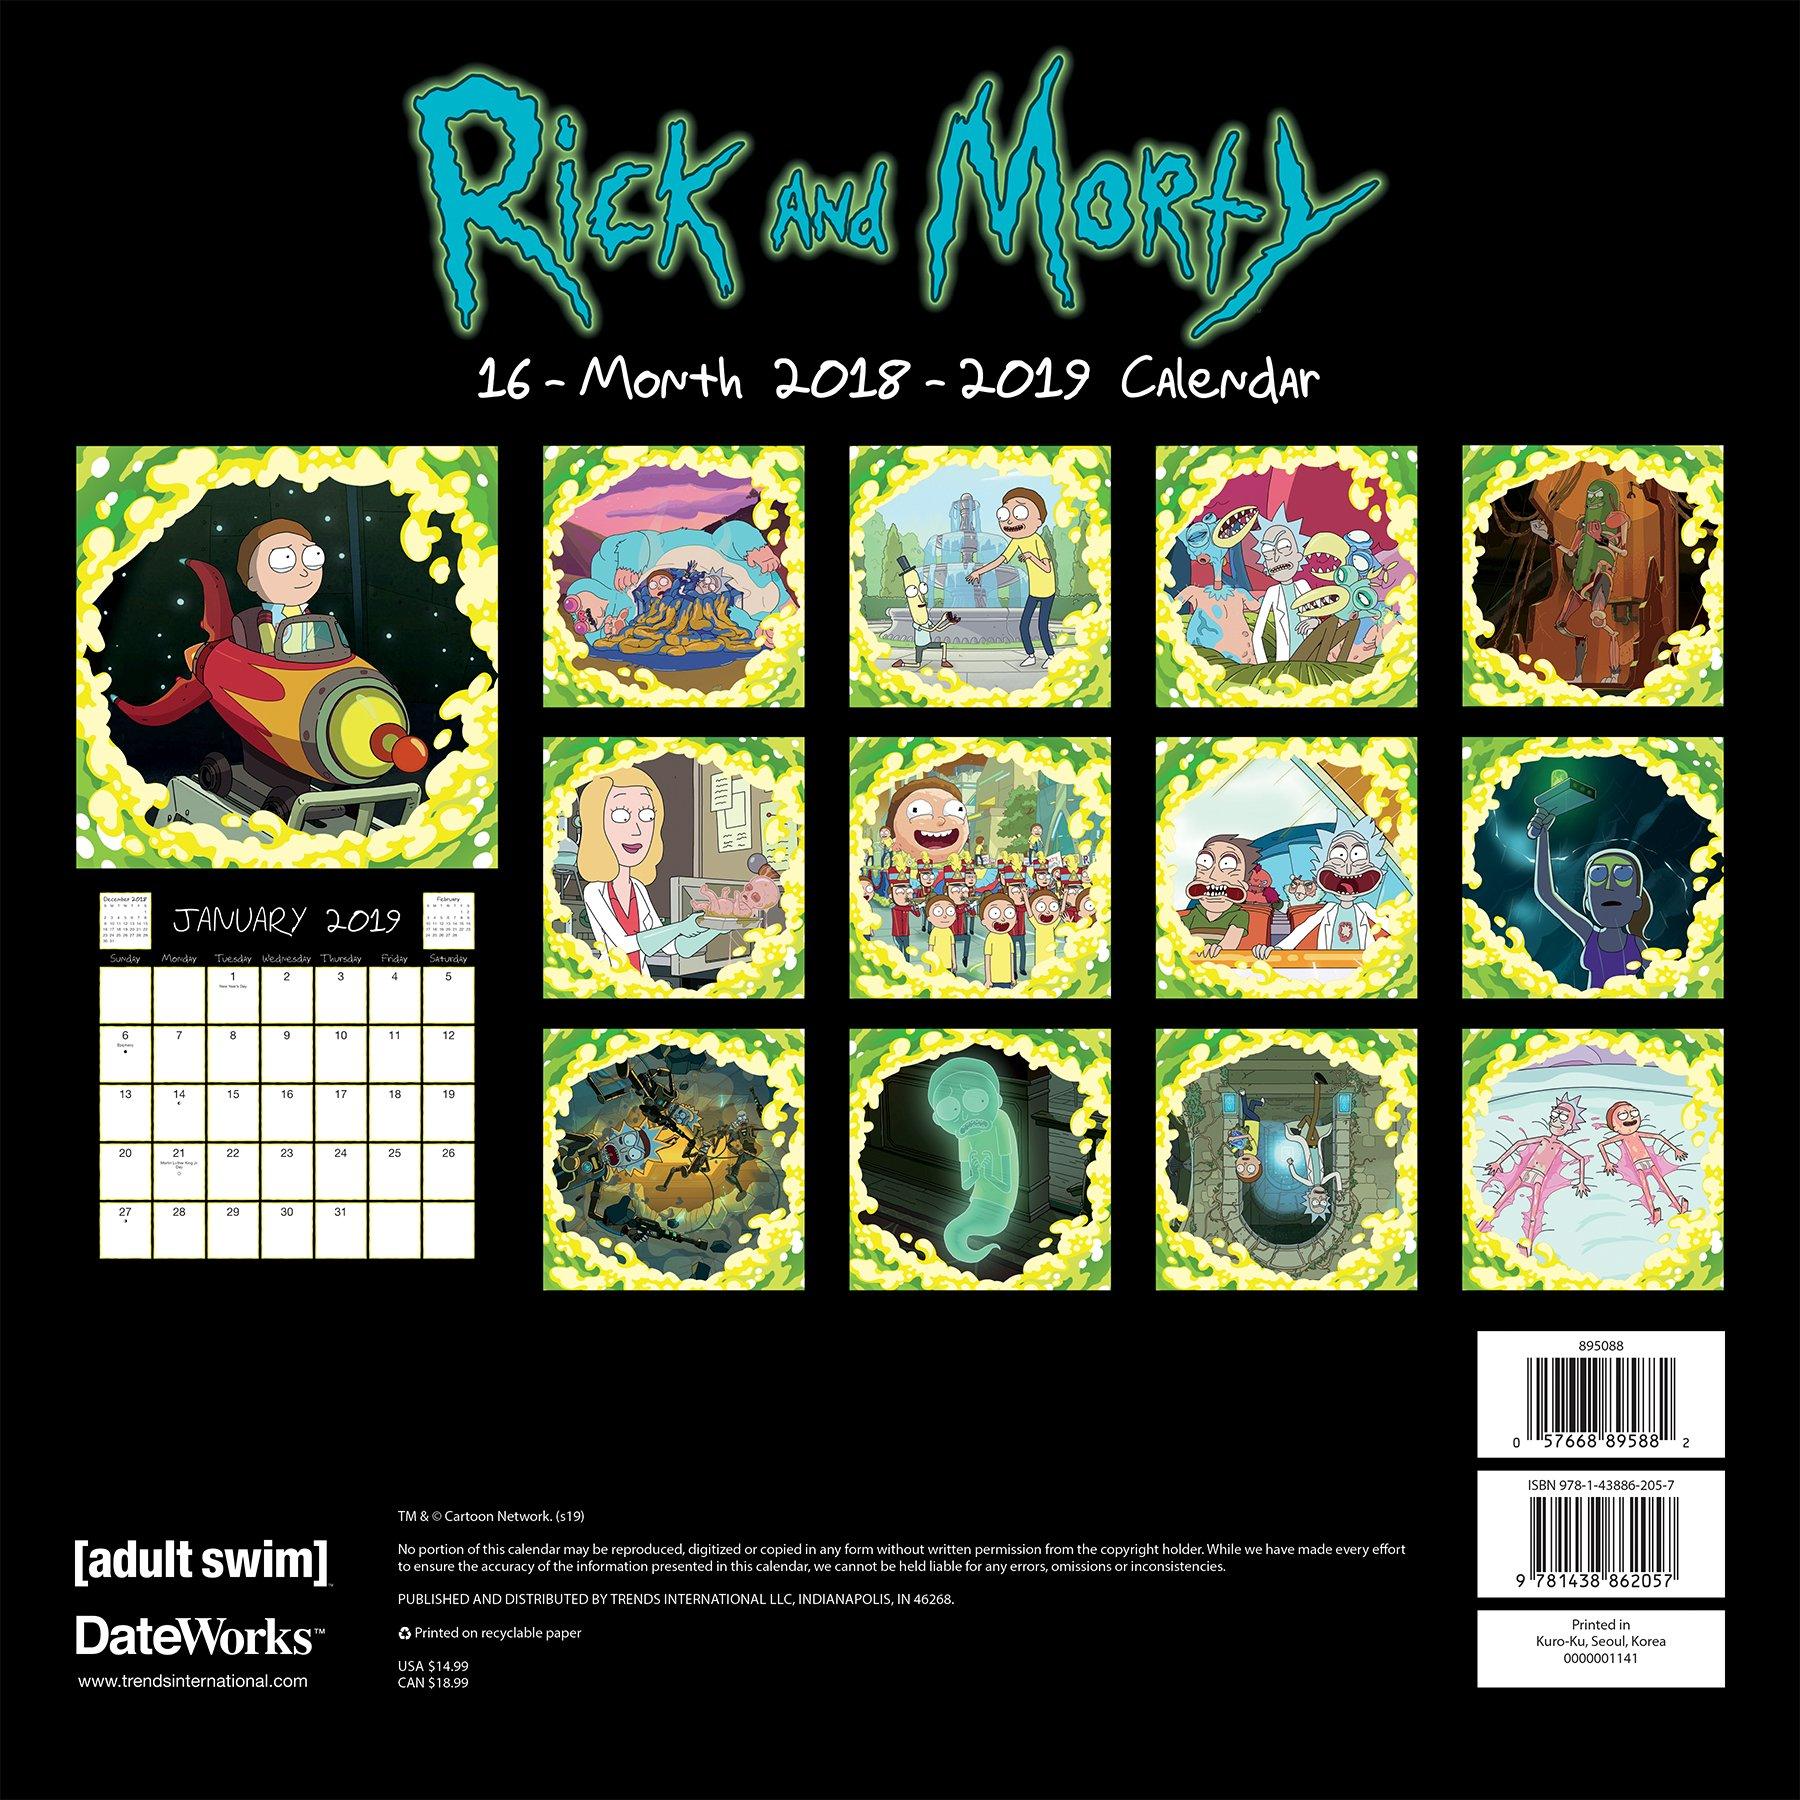 Calendario Coop 2020.2019 Rick And Morty Wall Calendar Trends International